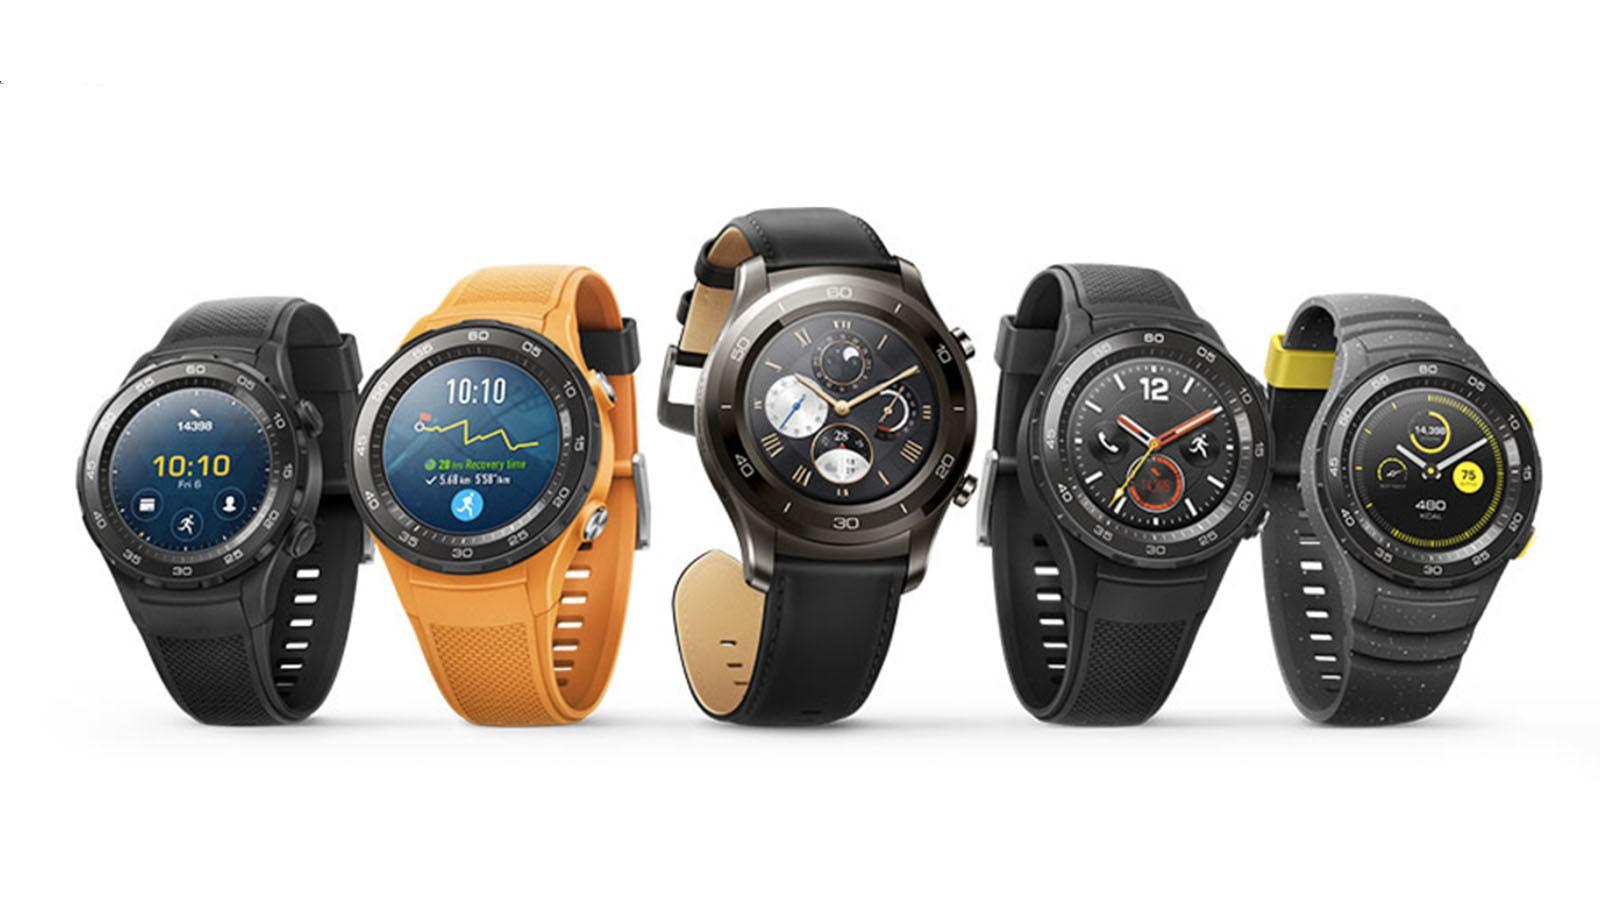 The Huawei 2 packs heavy tech into a light smartwatch